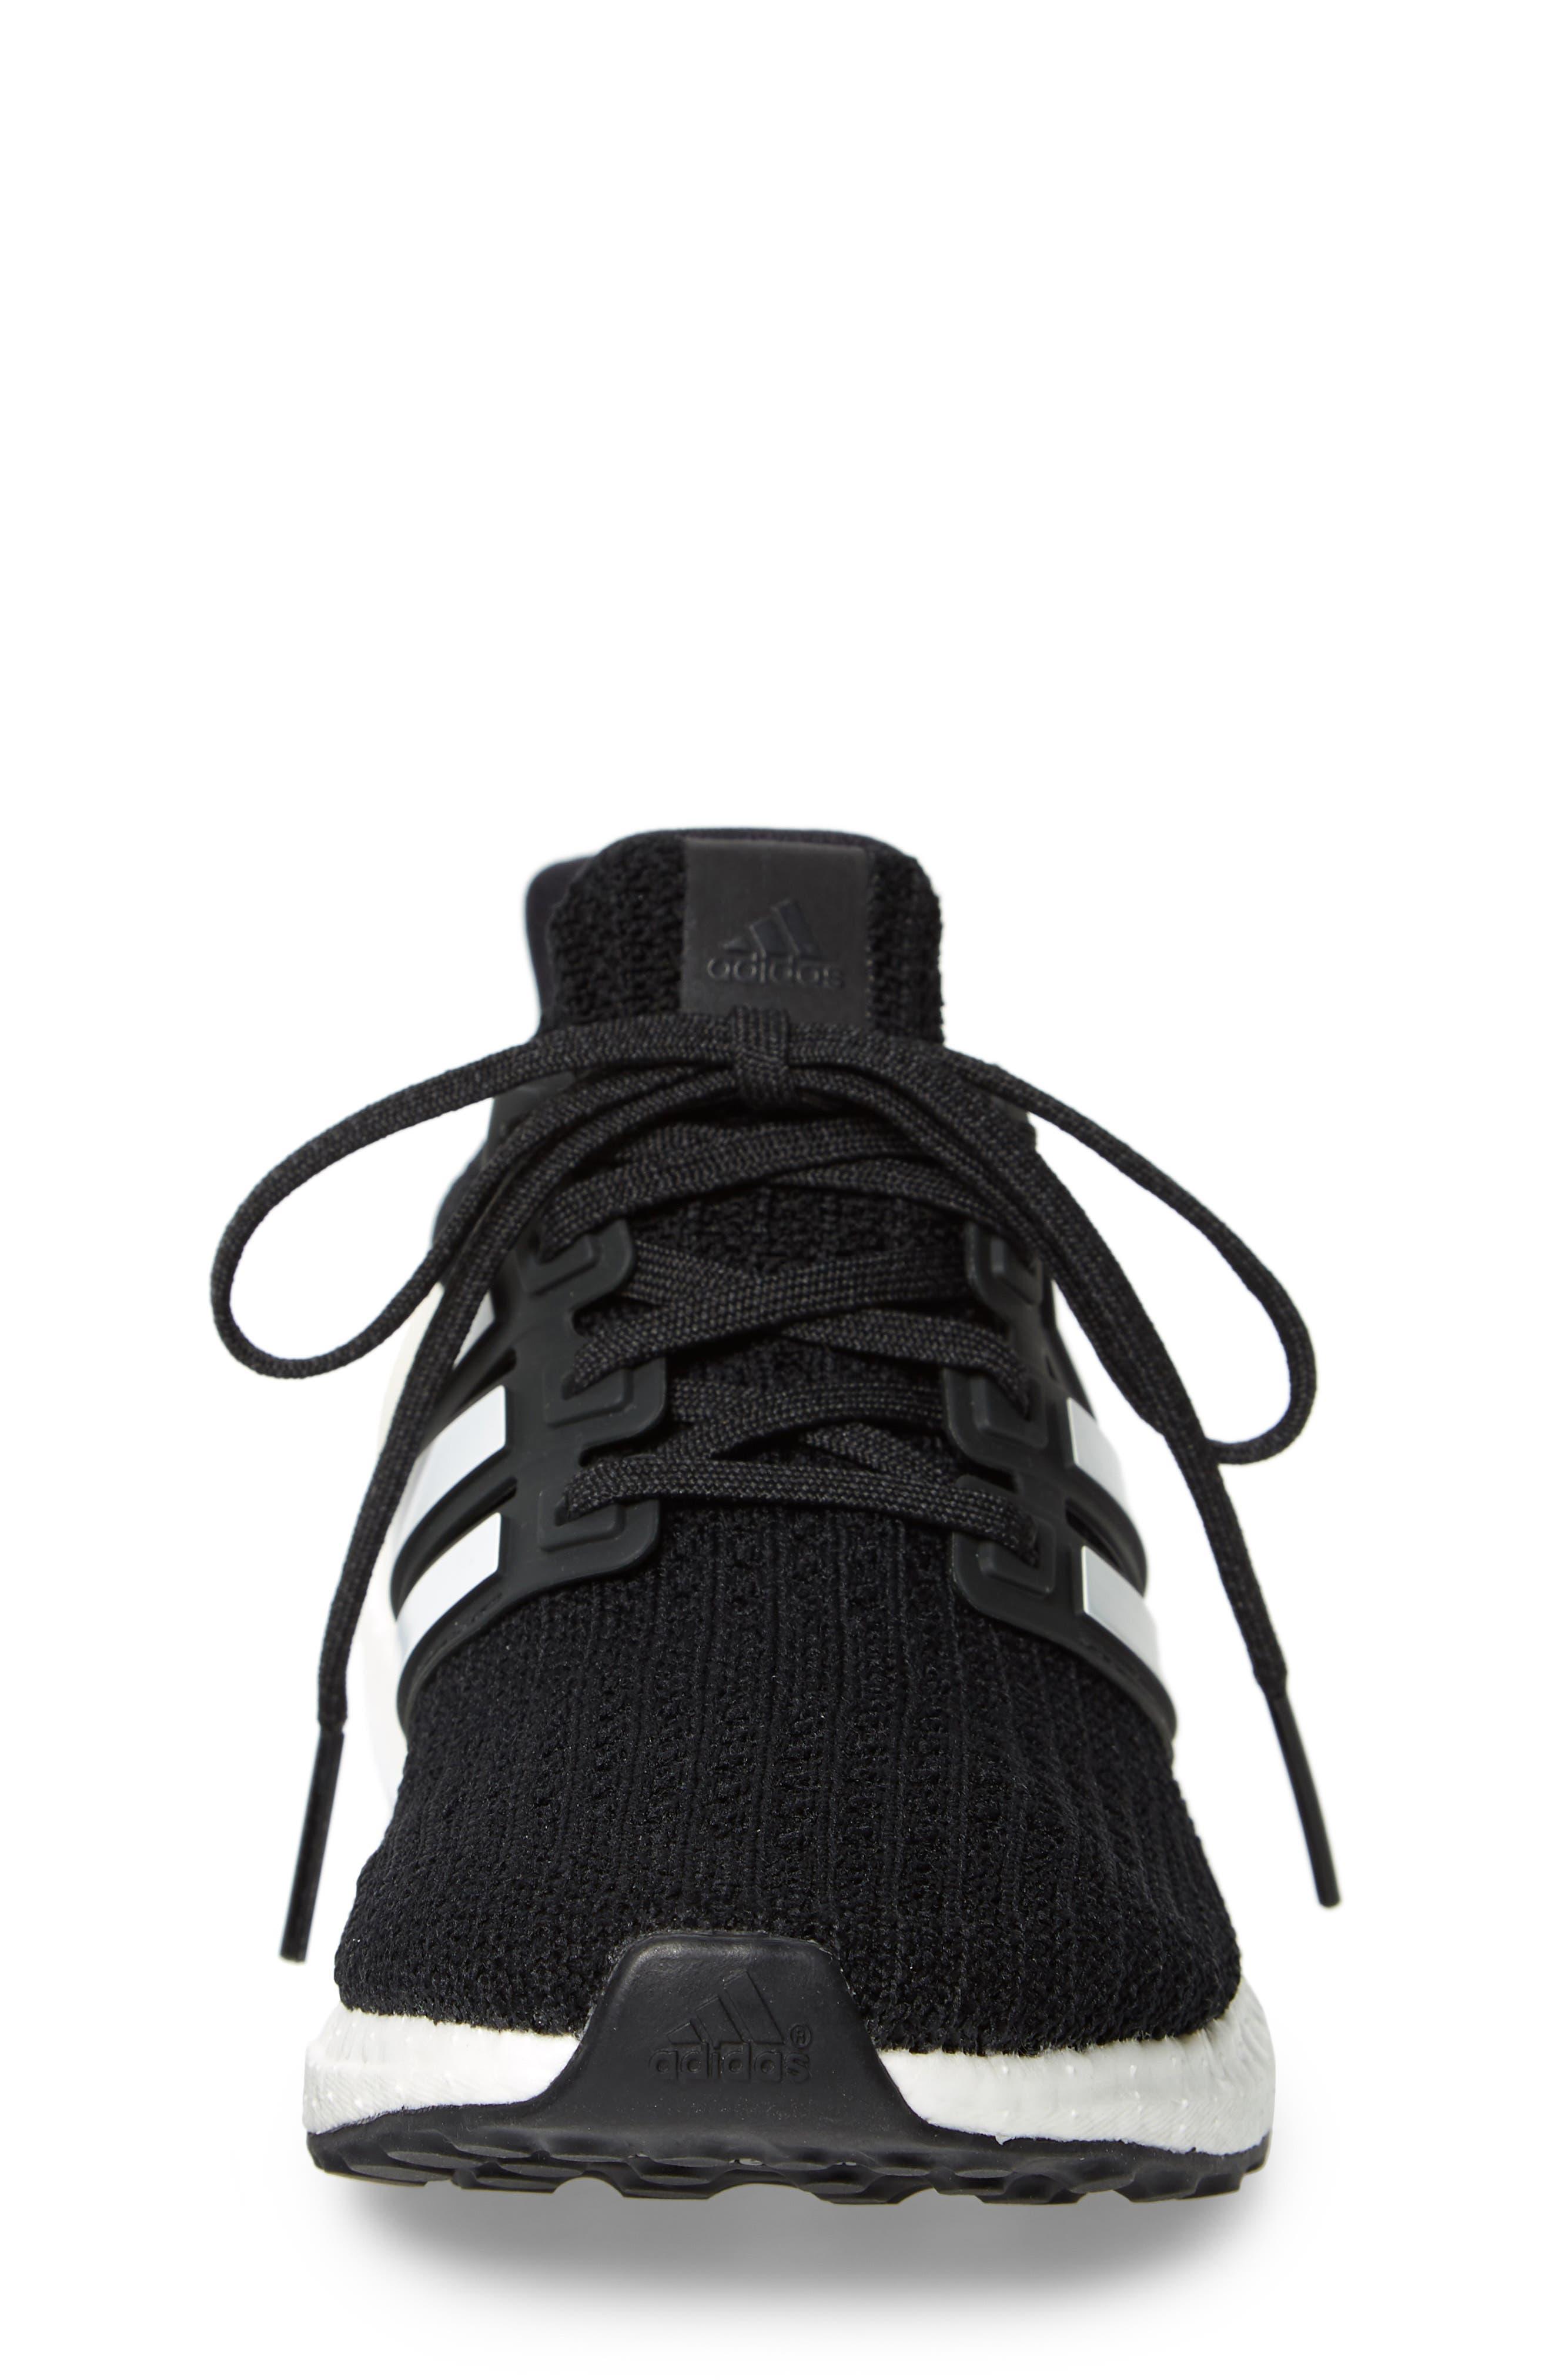 UltraBoost Sneaker,                             Alternate thumbnail 4, color,                             BLACK/ CLOUD WHITE/ CARBON